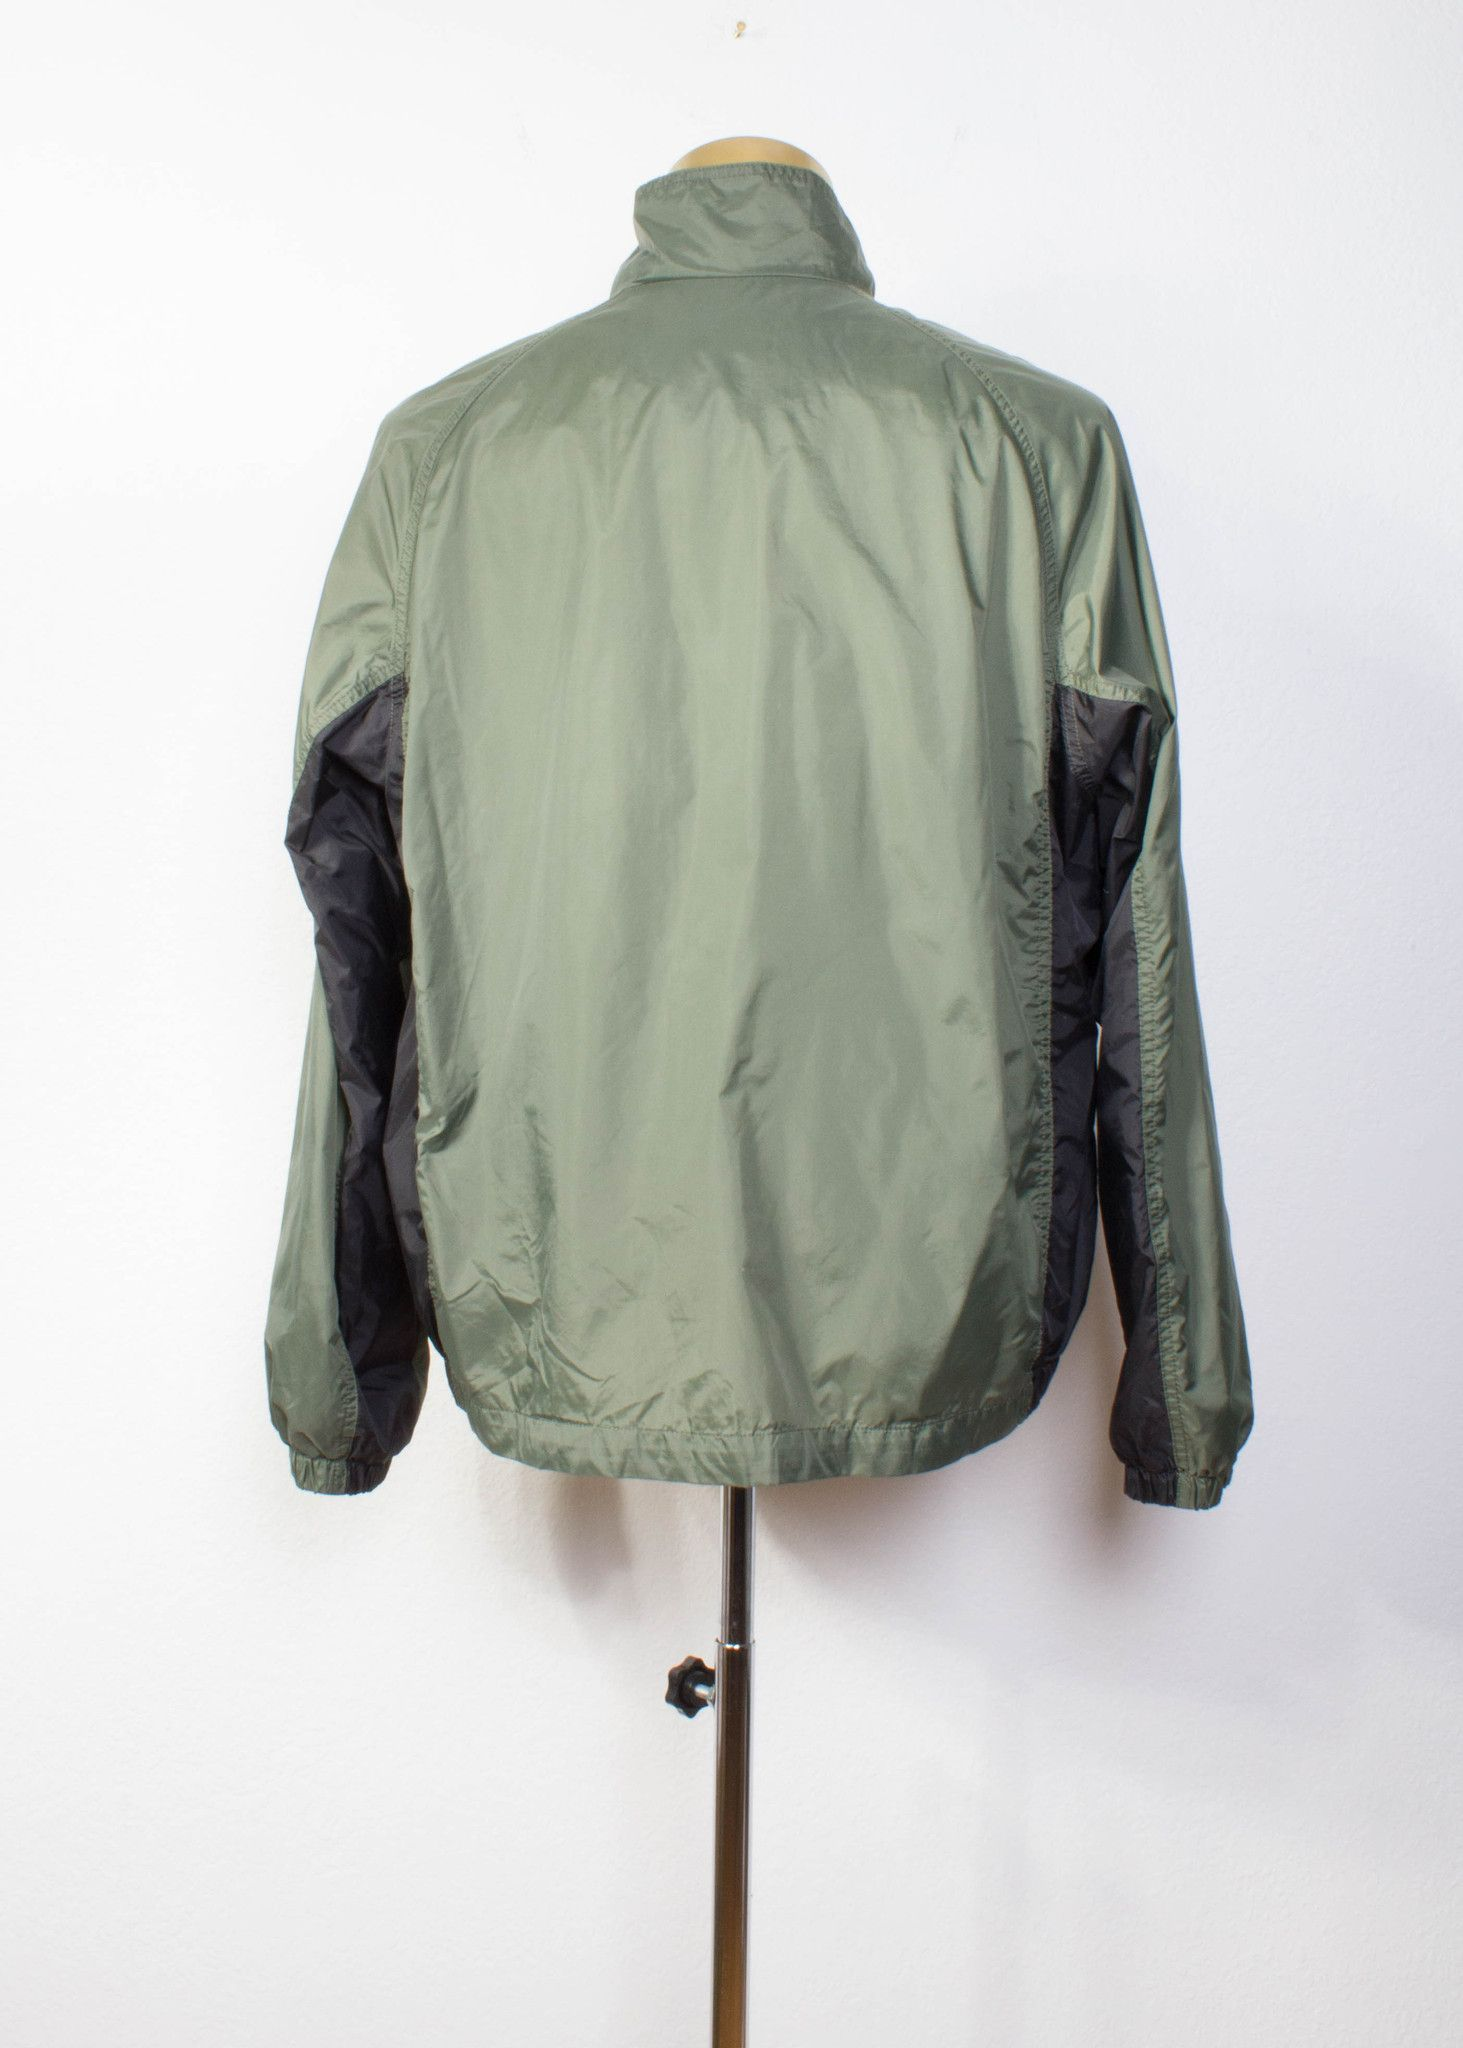 Nike jacket army - Nike Army Green Wind Breaker Jacket Large